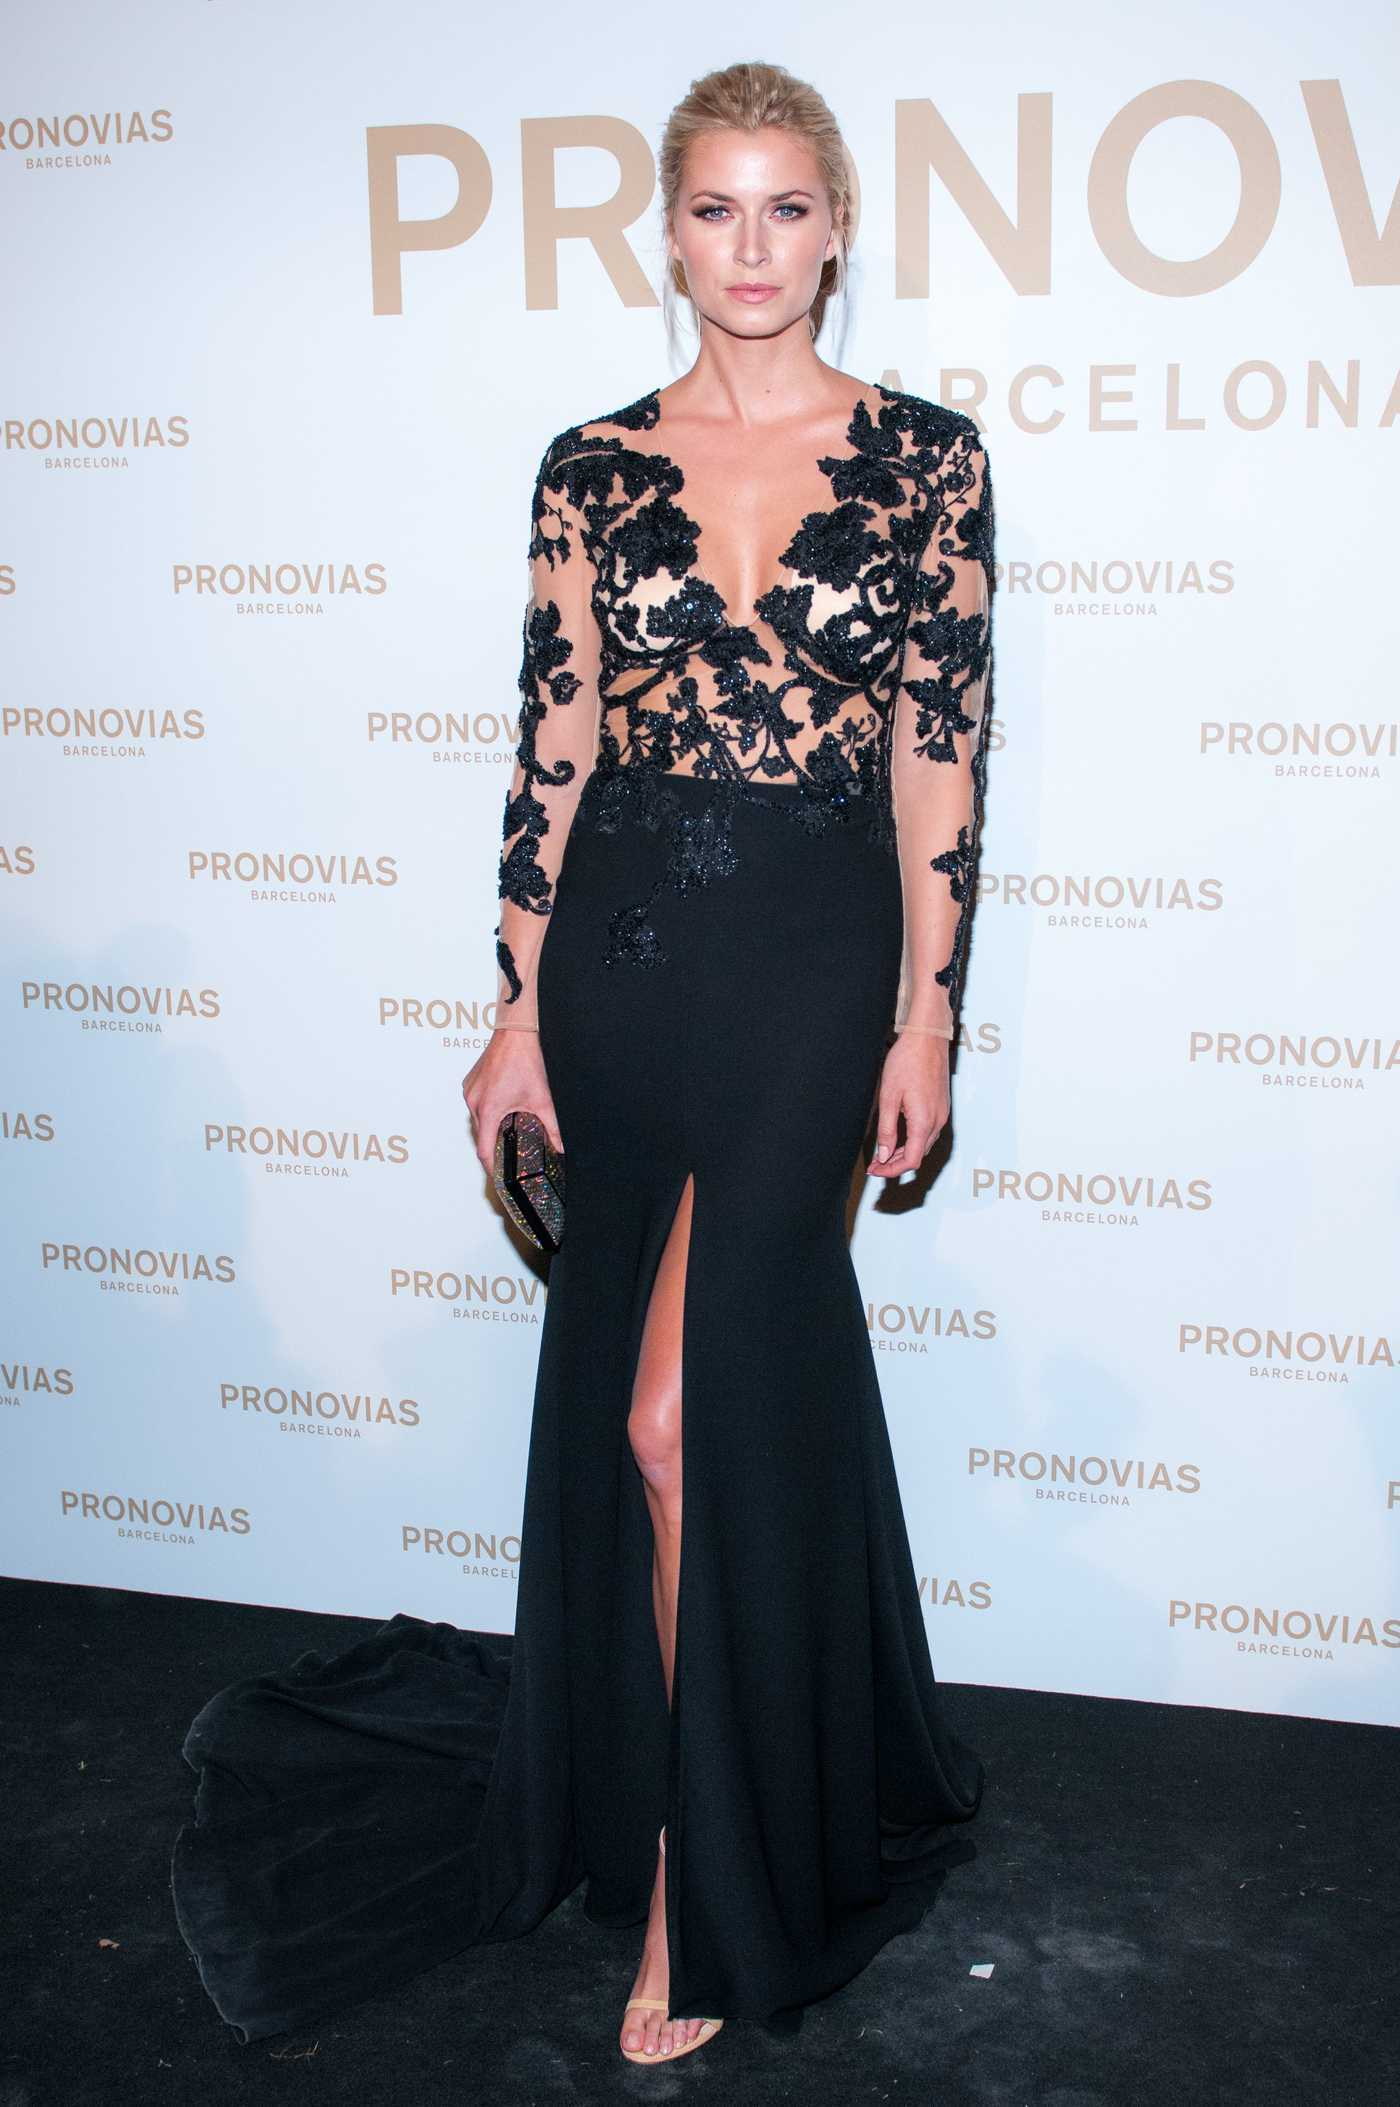 Lena Gercke at the Pronovias Catwalk Show Photocall in Barcelona 04/28/2017